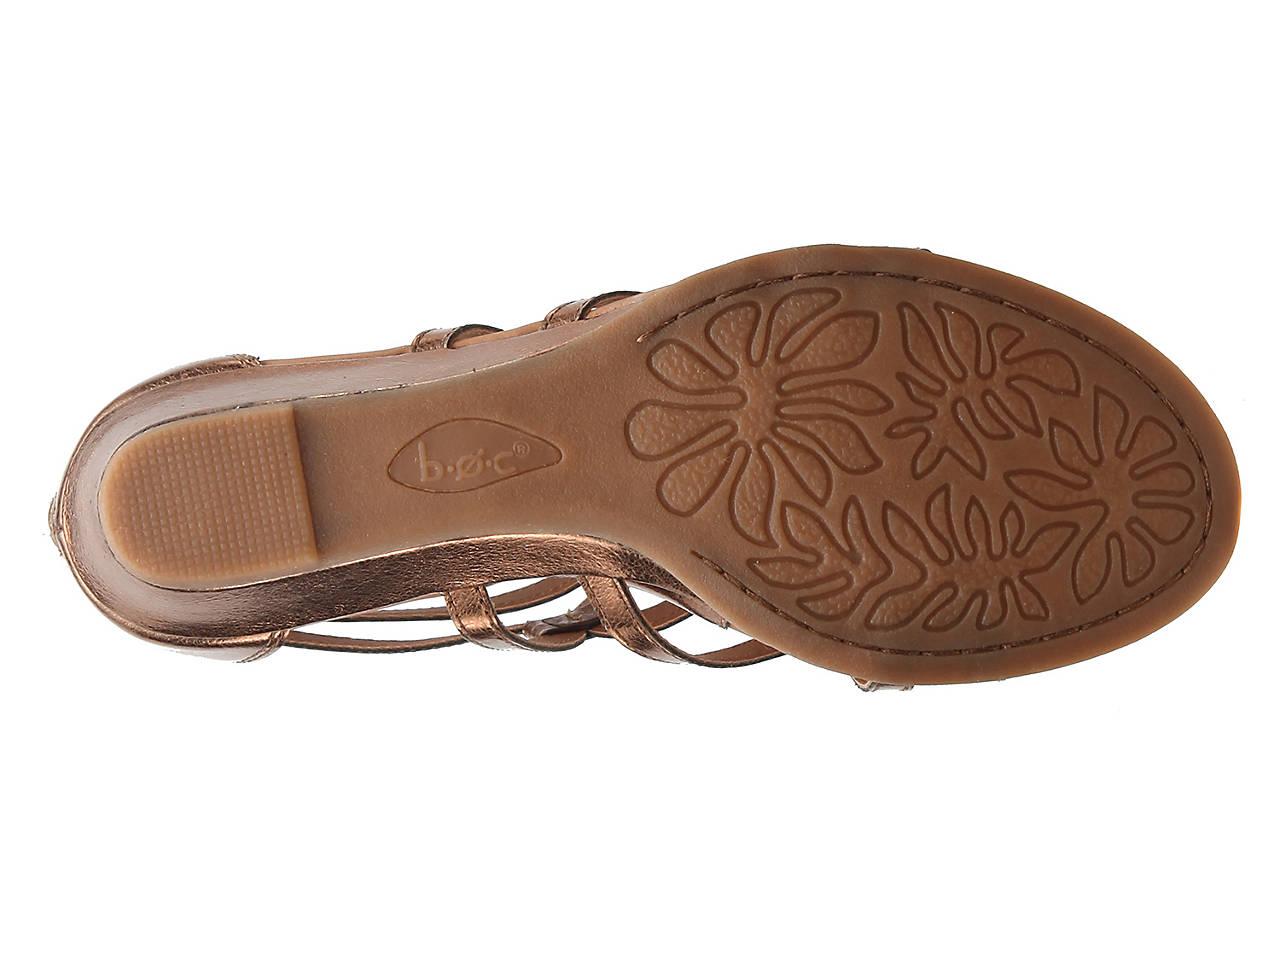 bacc32078528 b.o.c Pawel Wedge Gladiator Sandal Women s Shoes